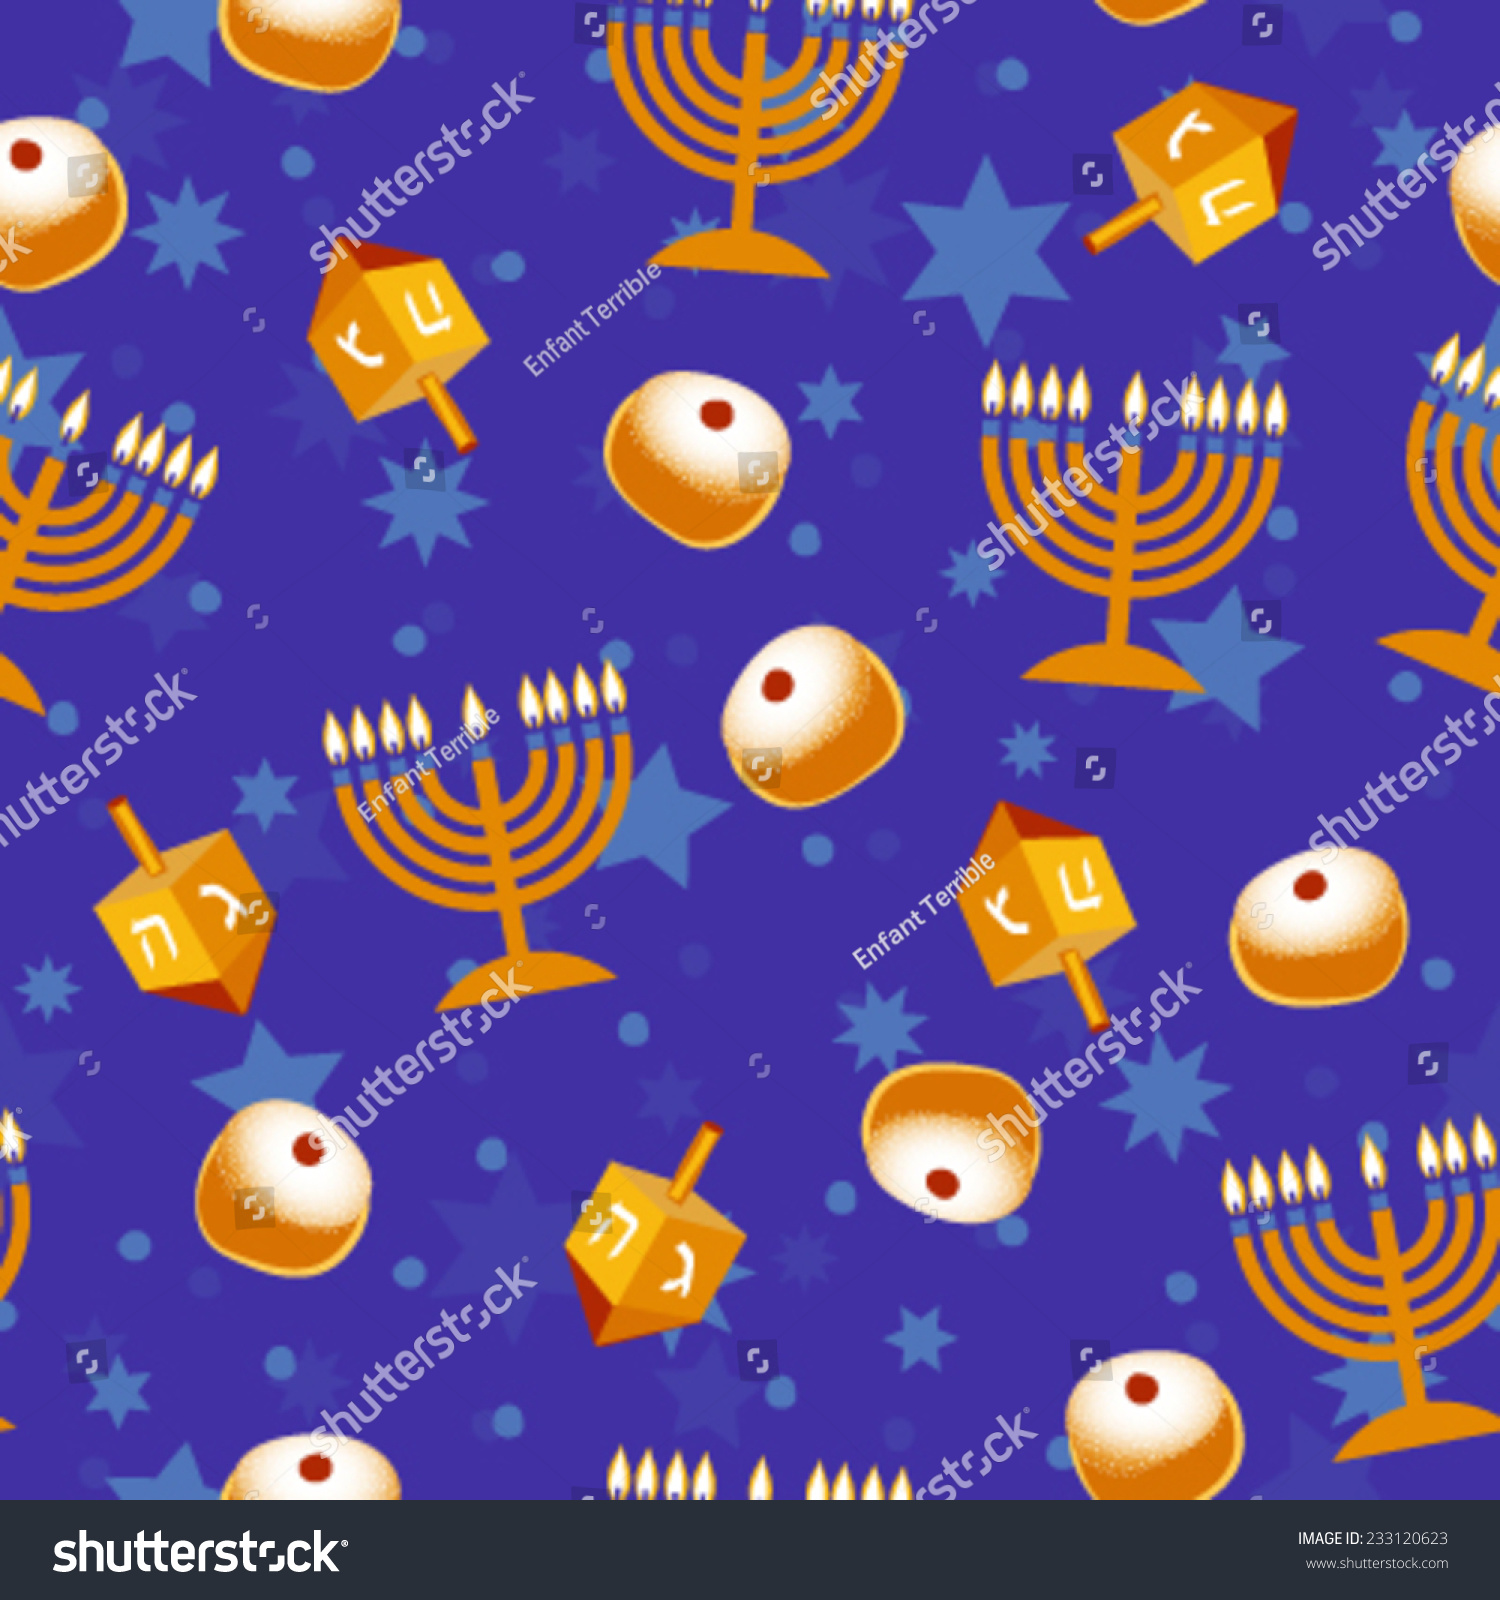 Hanukkah Seamless Pattern Vector Background Wallpaper Stock Vector